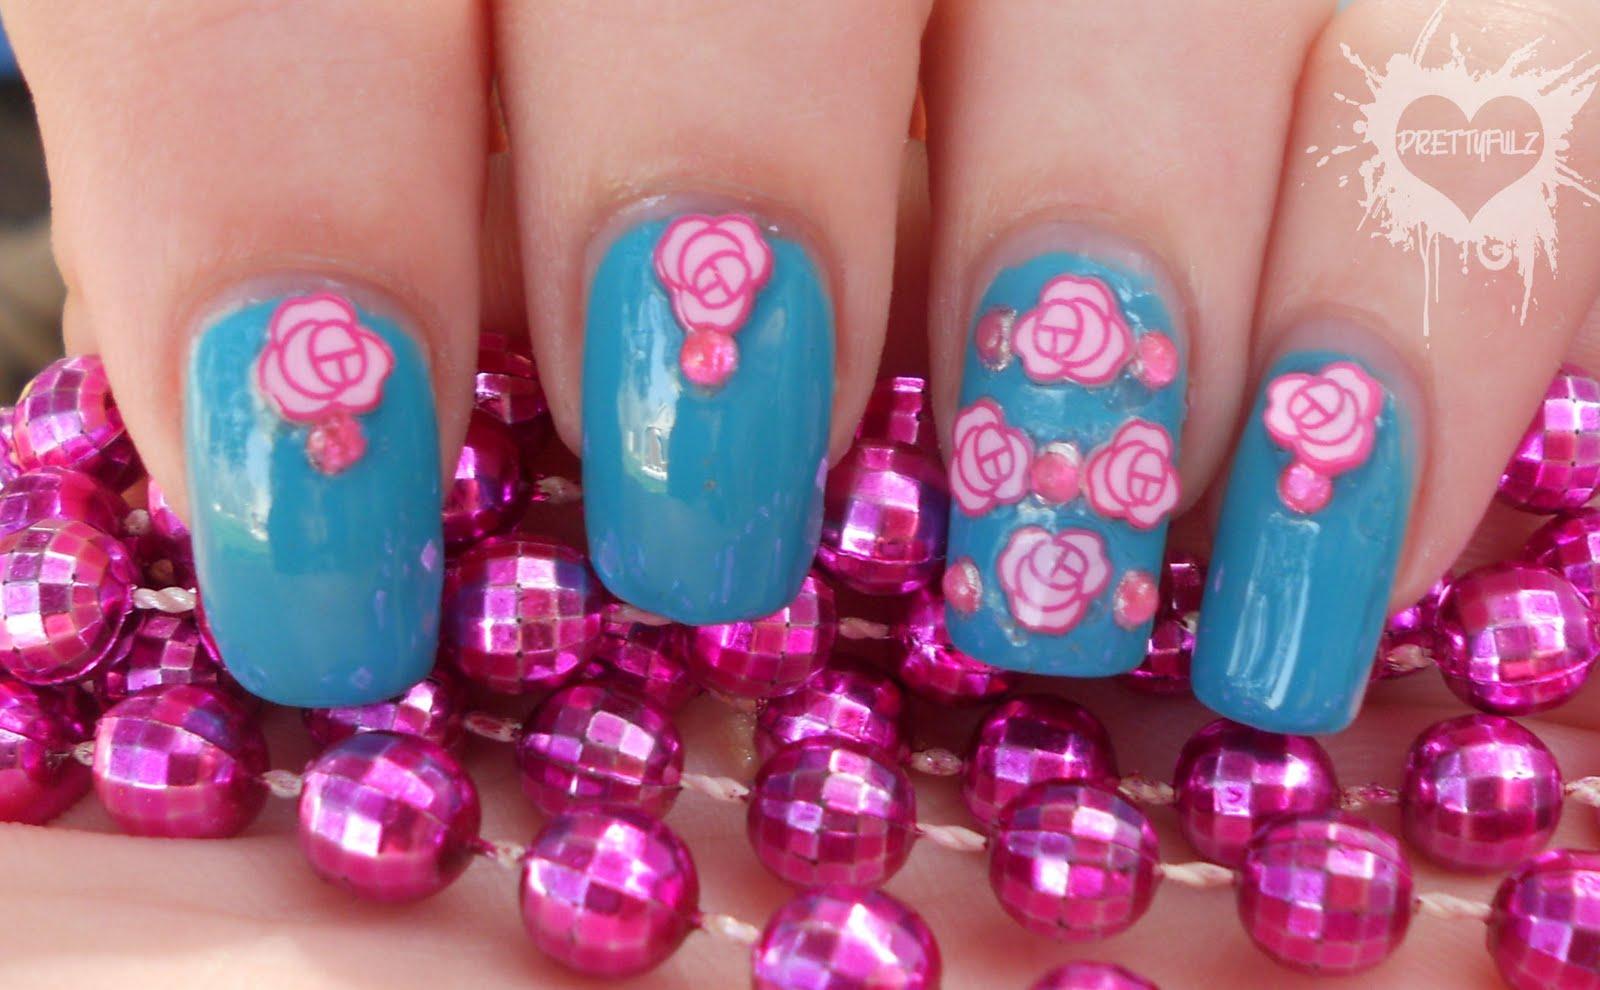 Prettyfulz Pretty Pink Teal Flower Nail Art Design